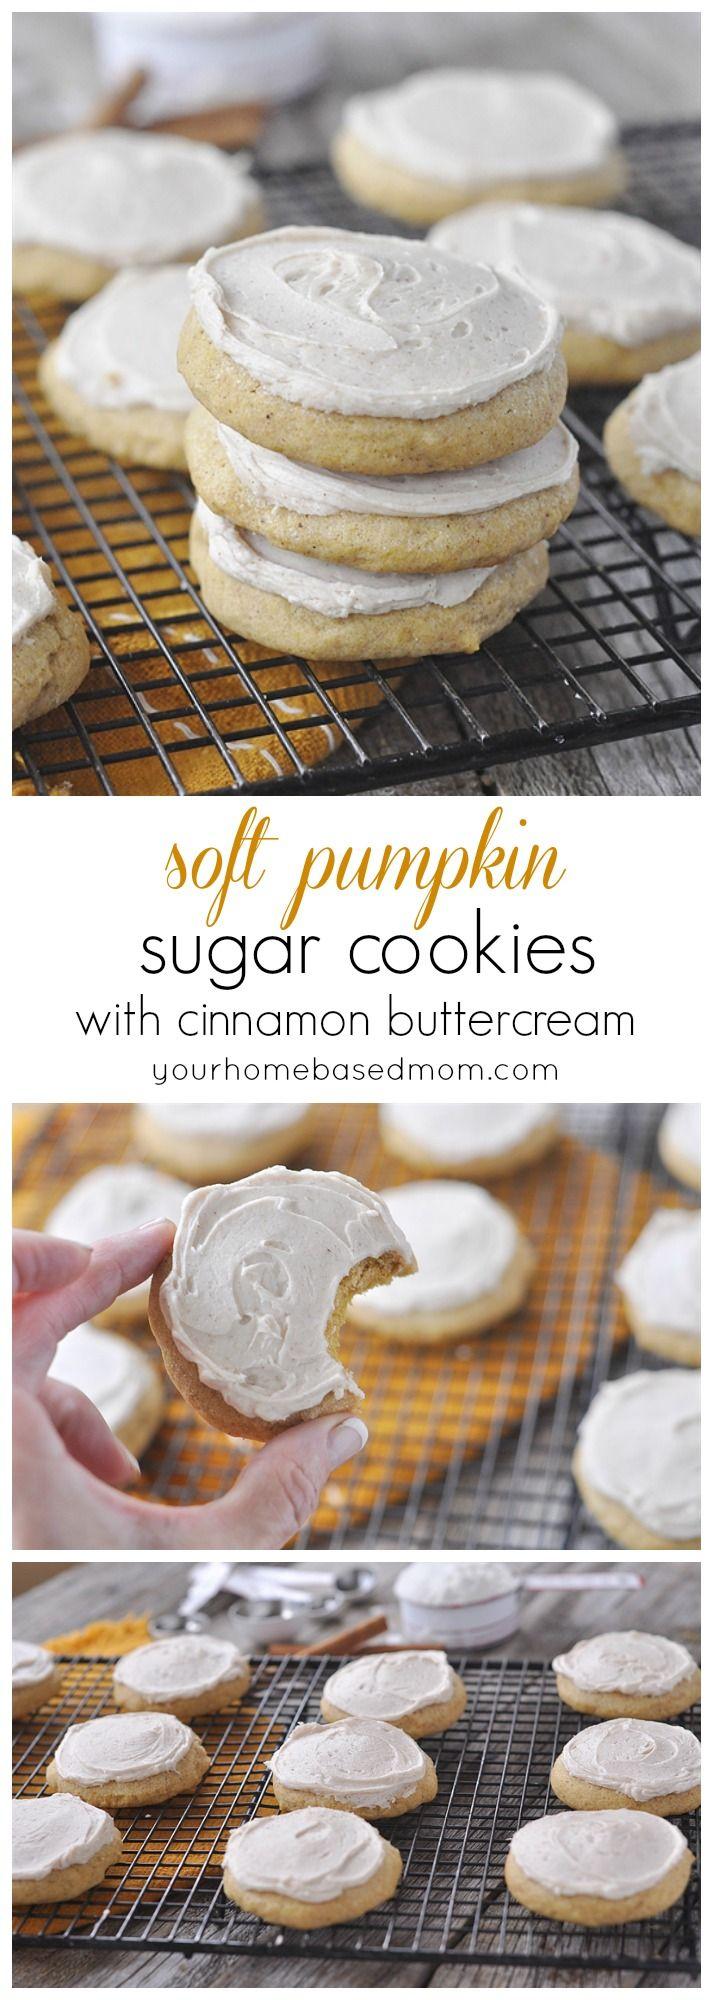 Soft Pumpkin Sugar Cookies with Cinnamon Buttercream